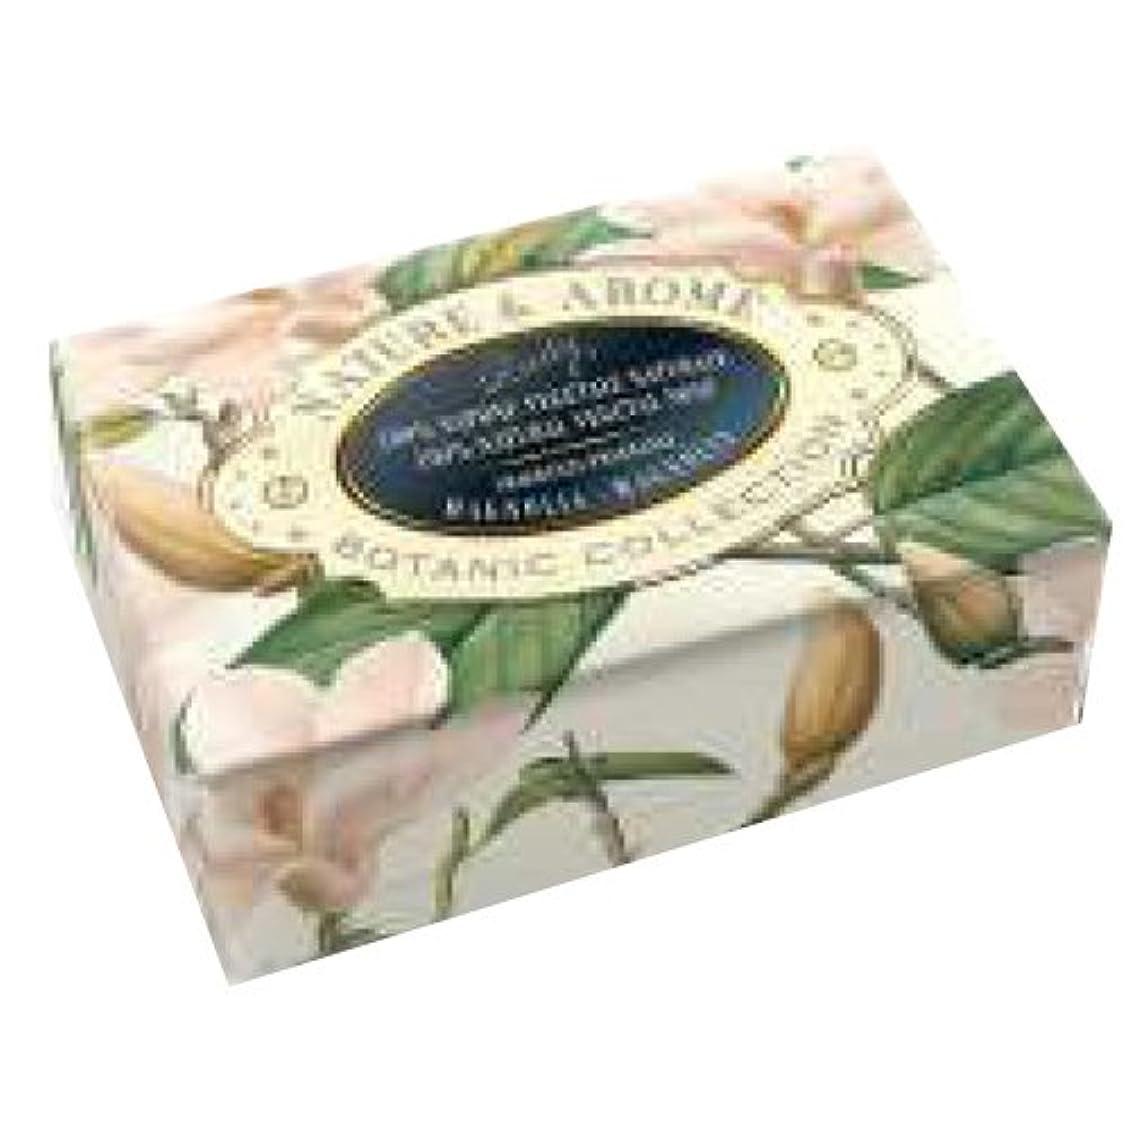 RUDY Nature&Arome SERIES ルディ ナチュール&アロマ Soap ソープ マグノリア